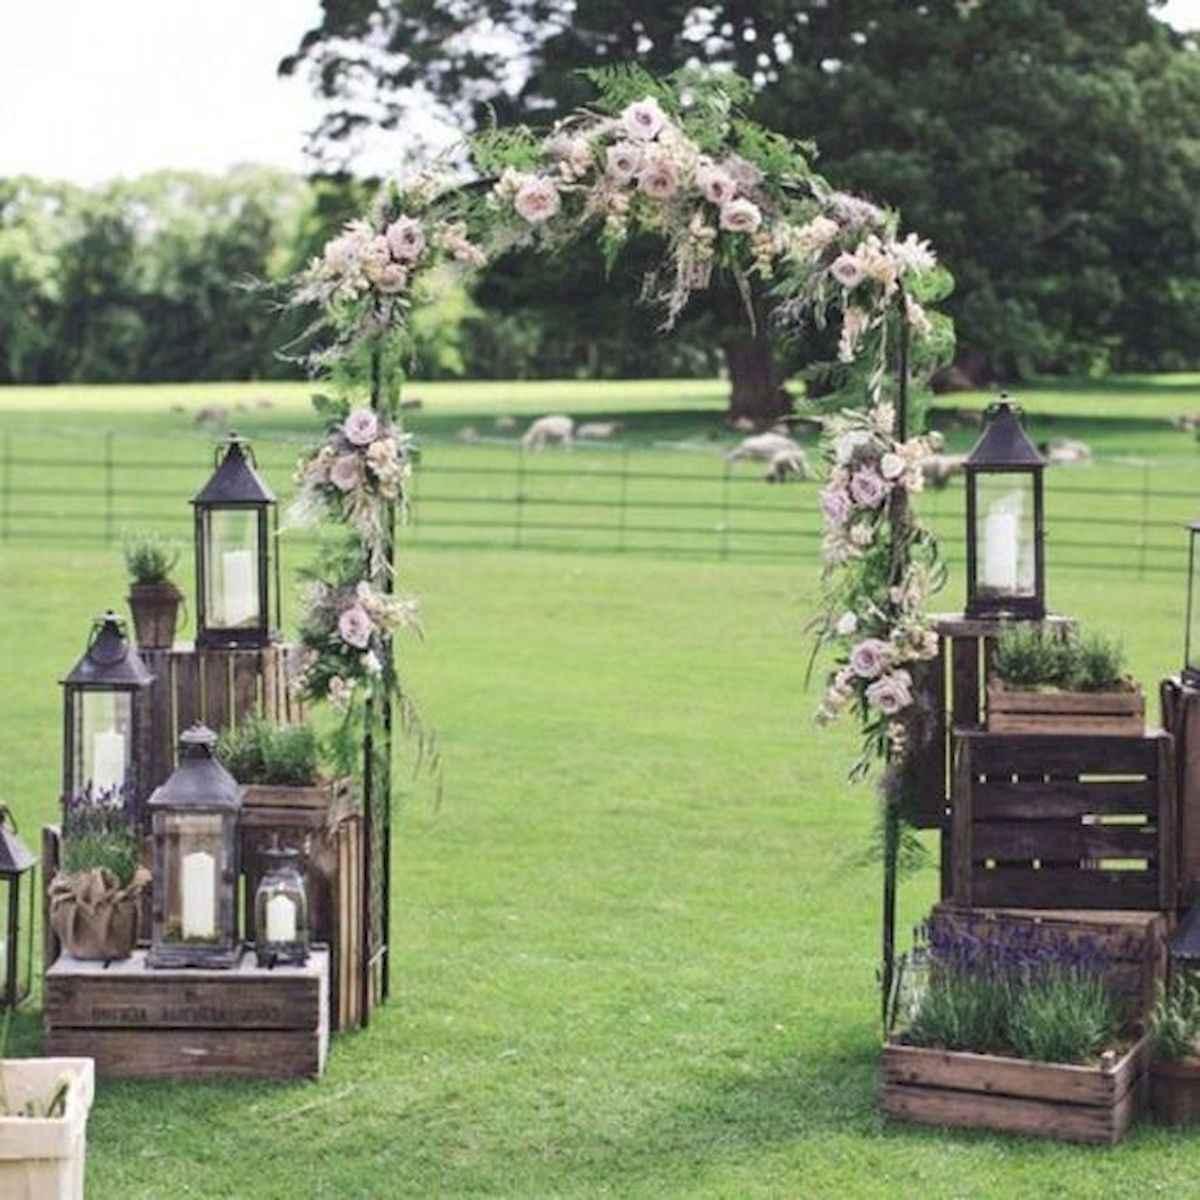 40 awesome backyard wedding decor ideas (38)